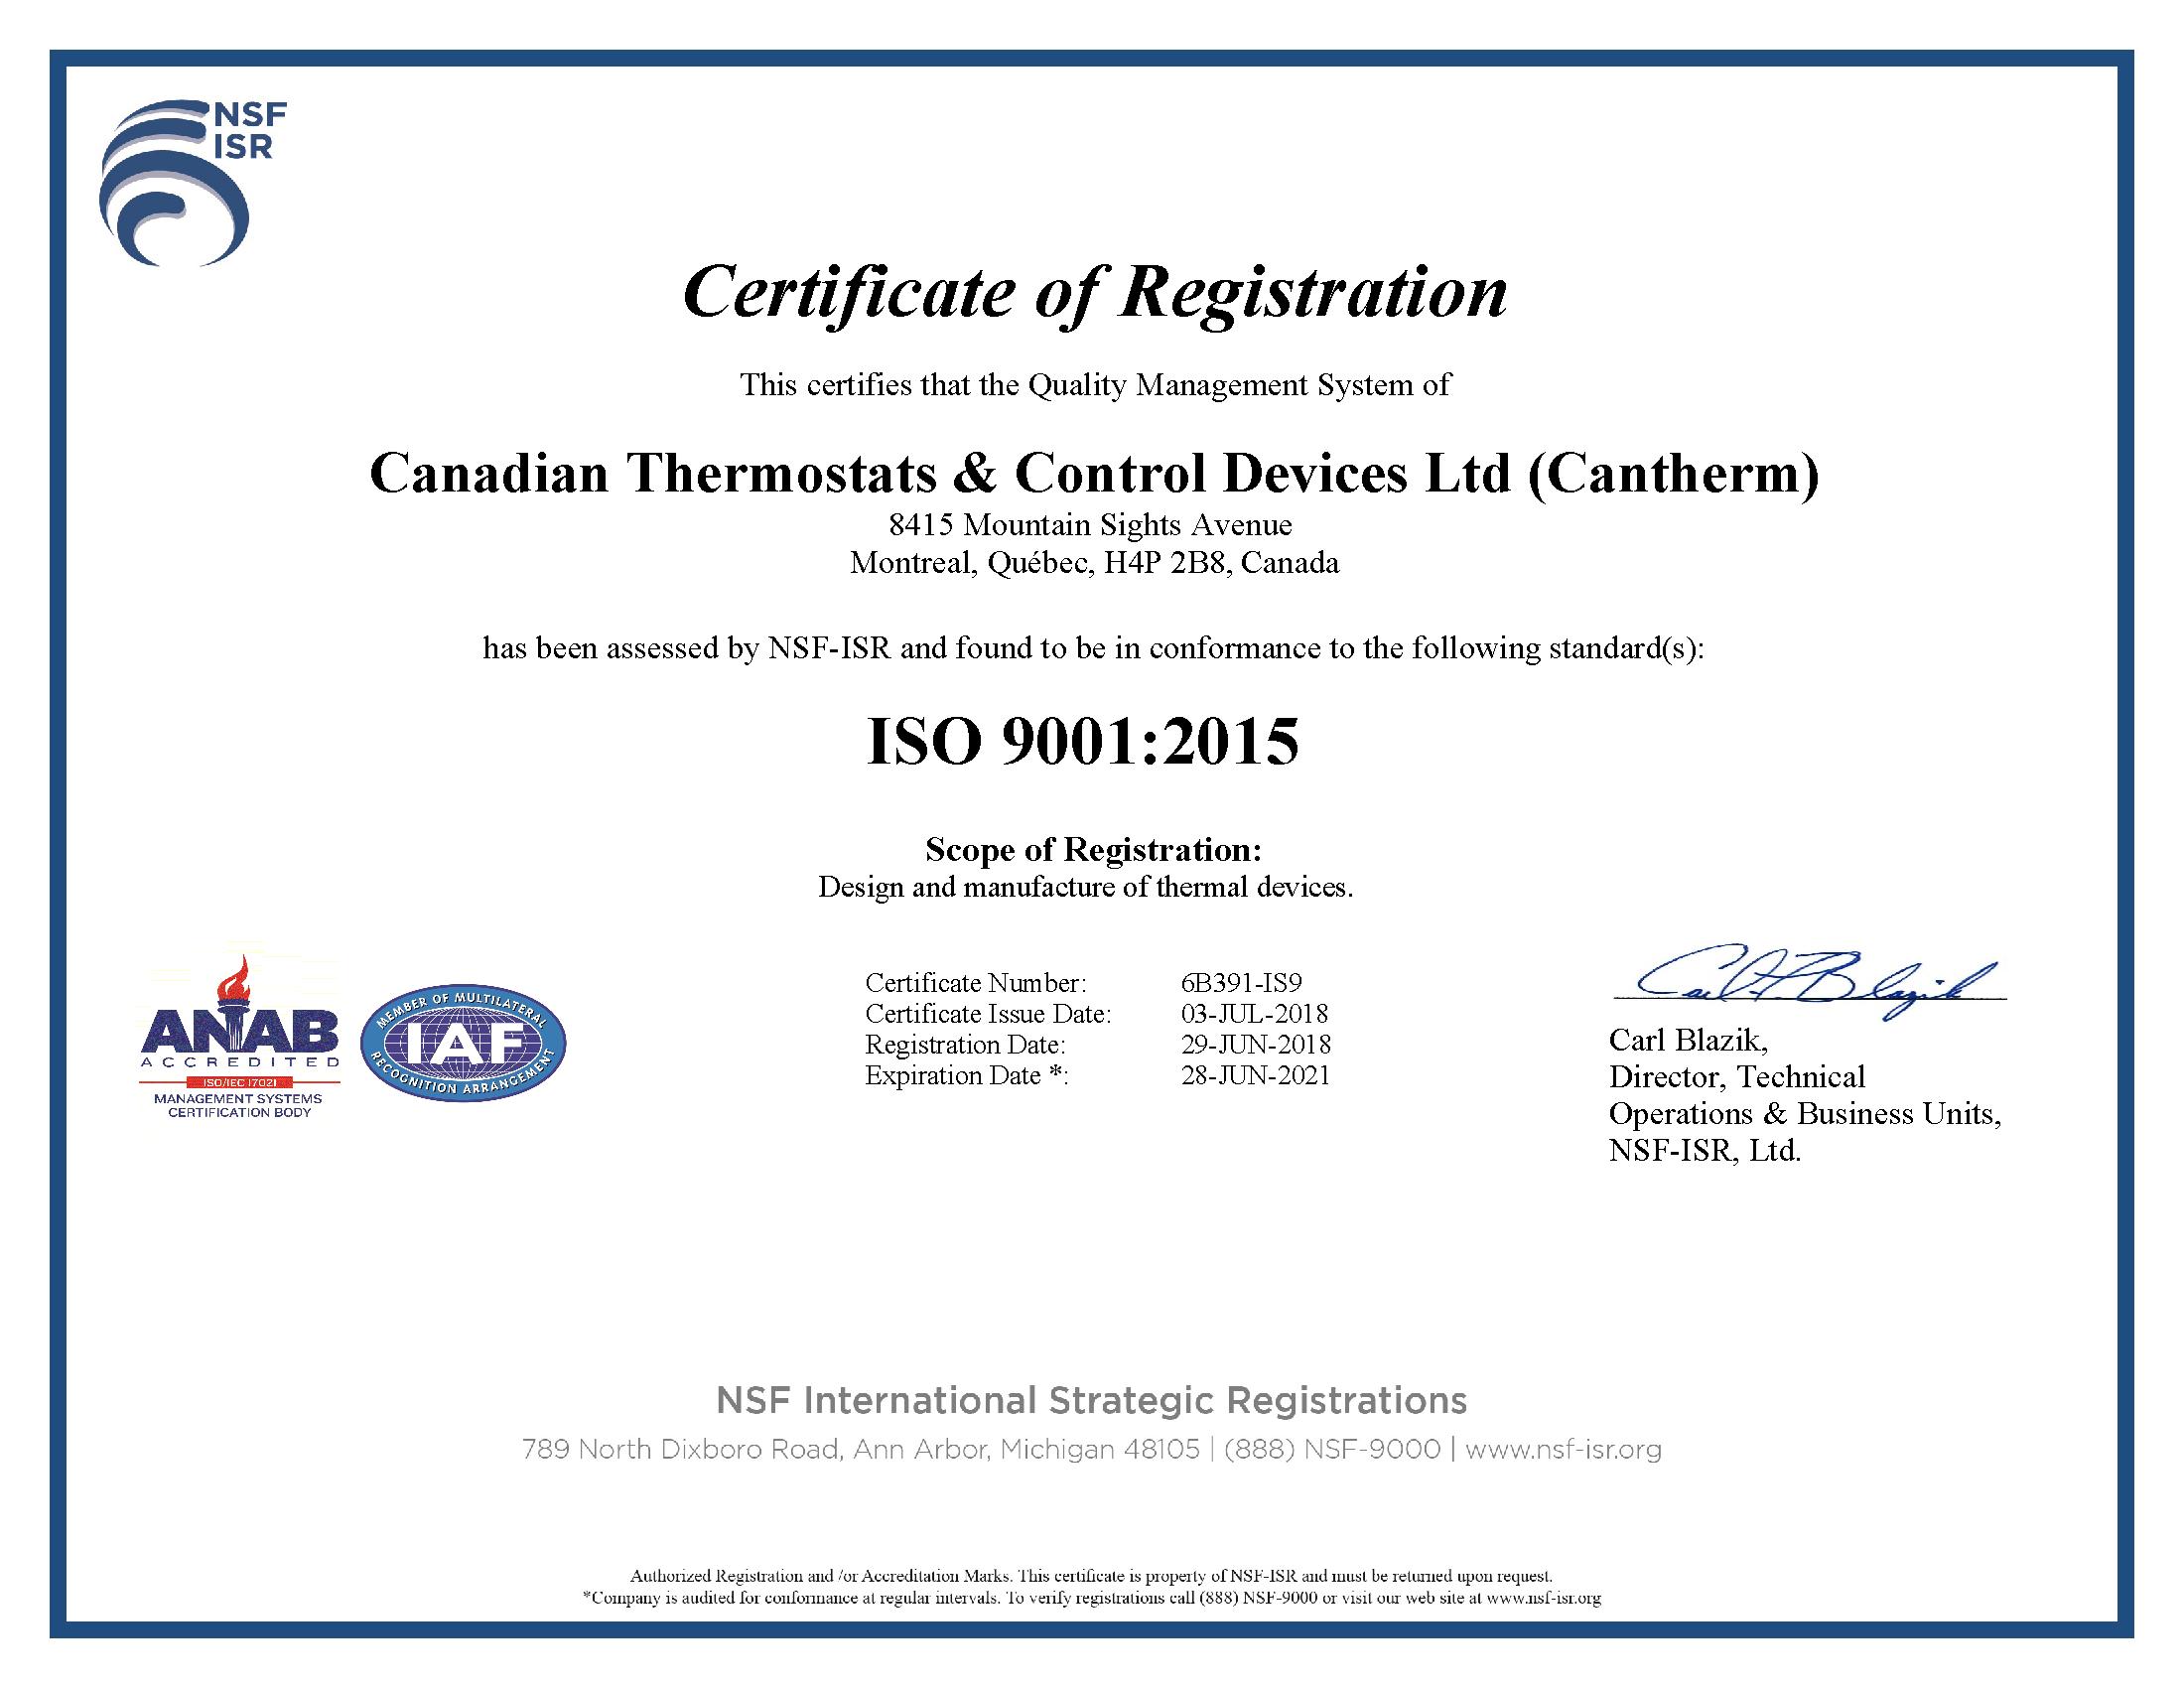 iso 22301 standard pdf free download